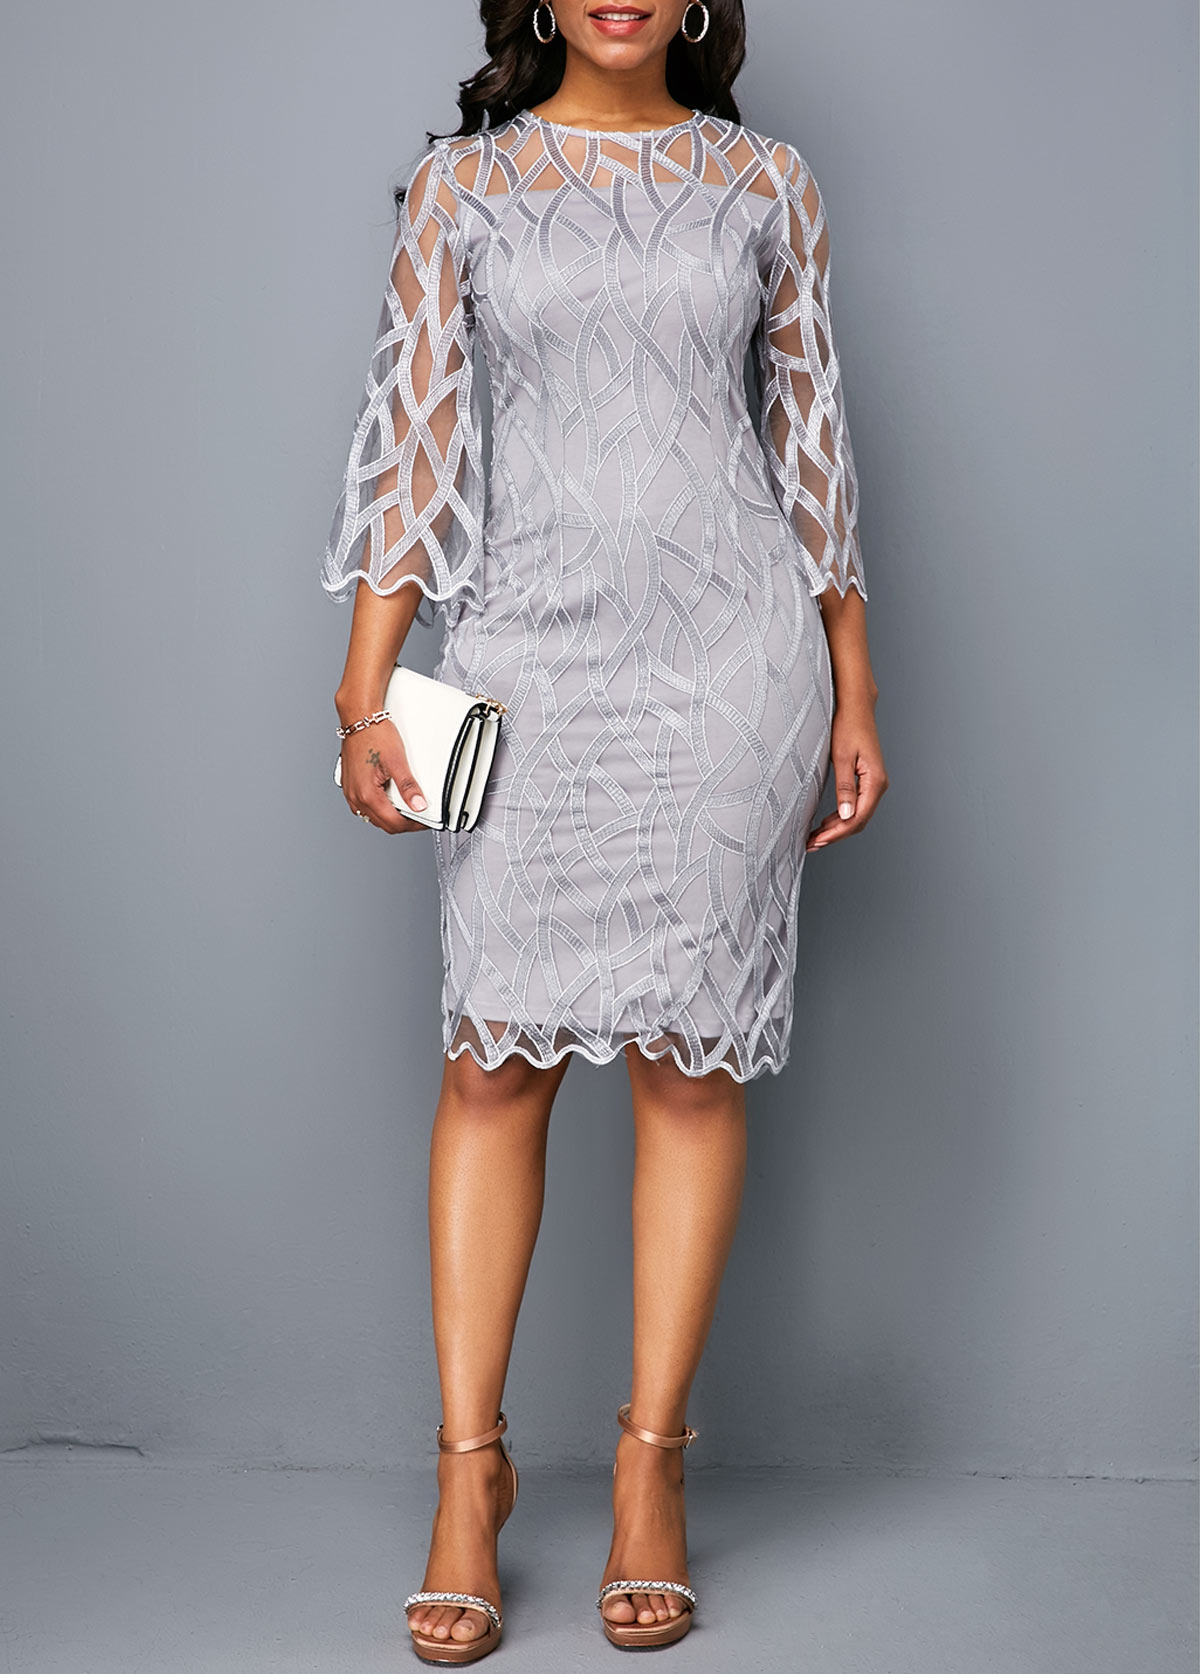 Round Neck Scalloped Hem Light Grey Lace Sheath Dress